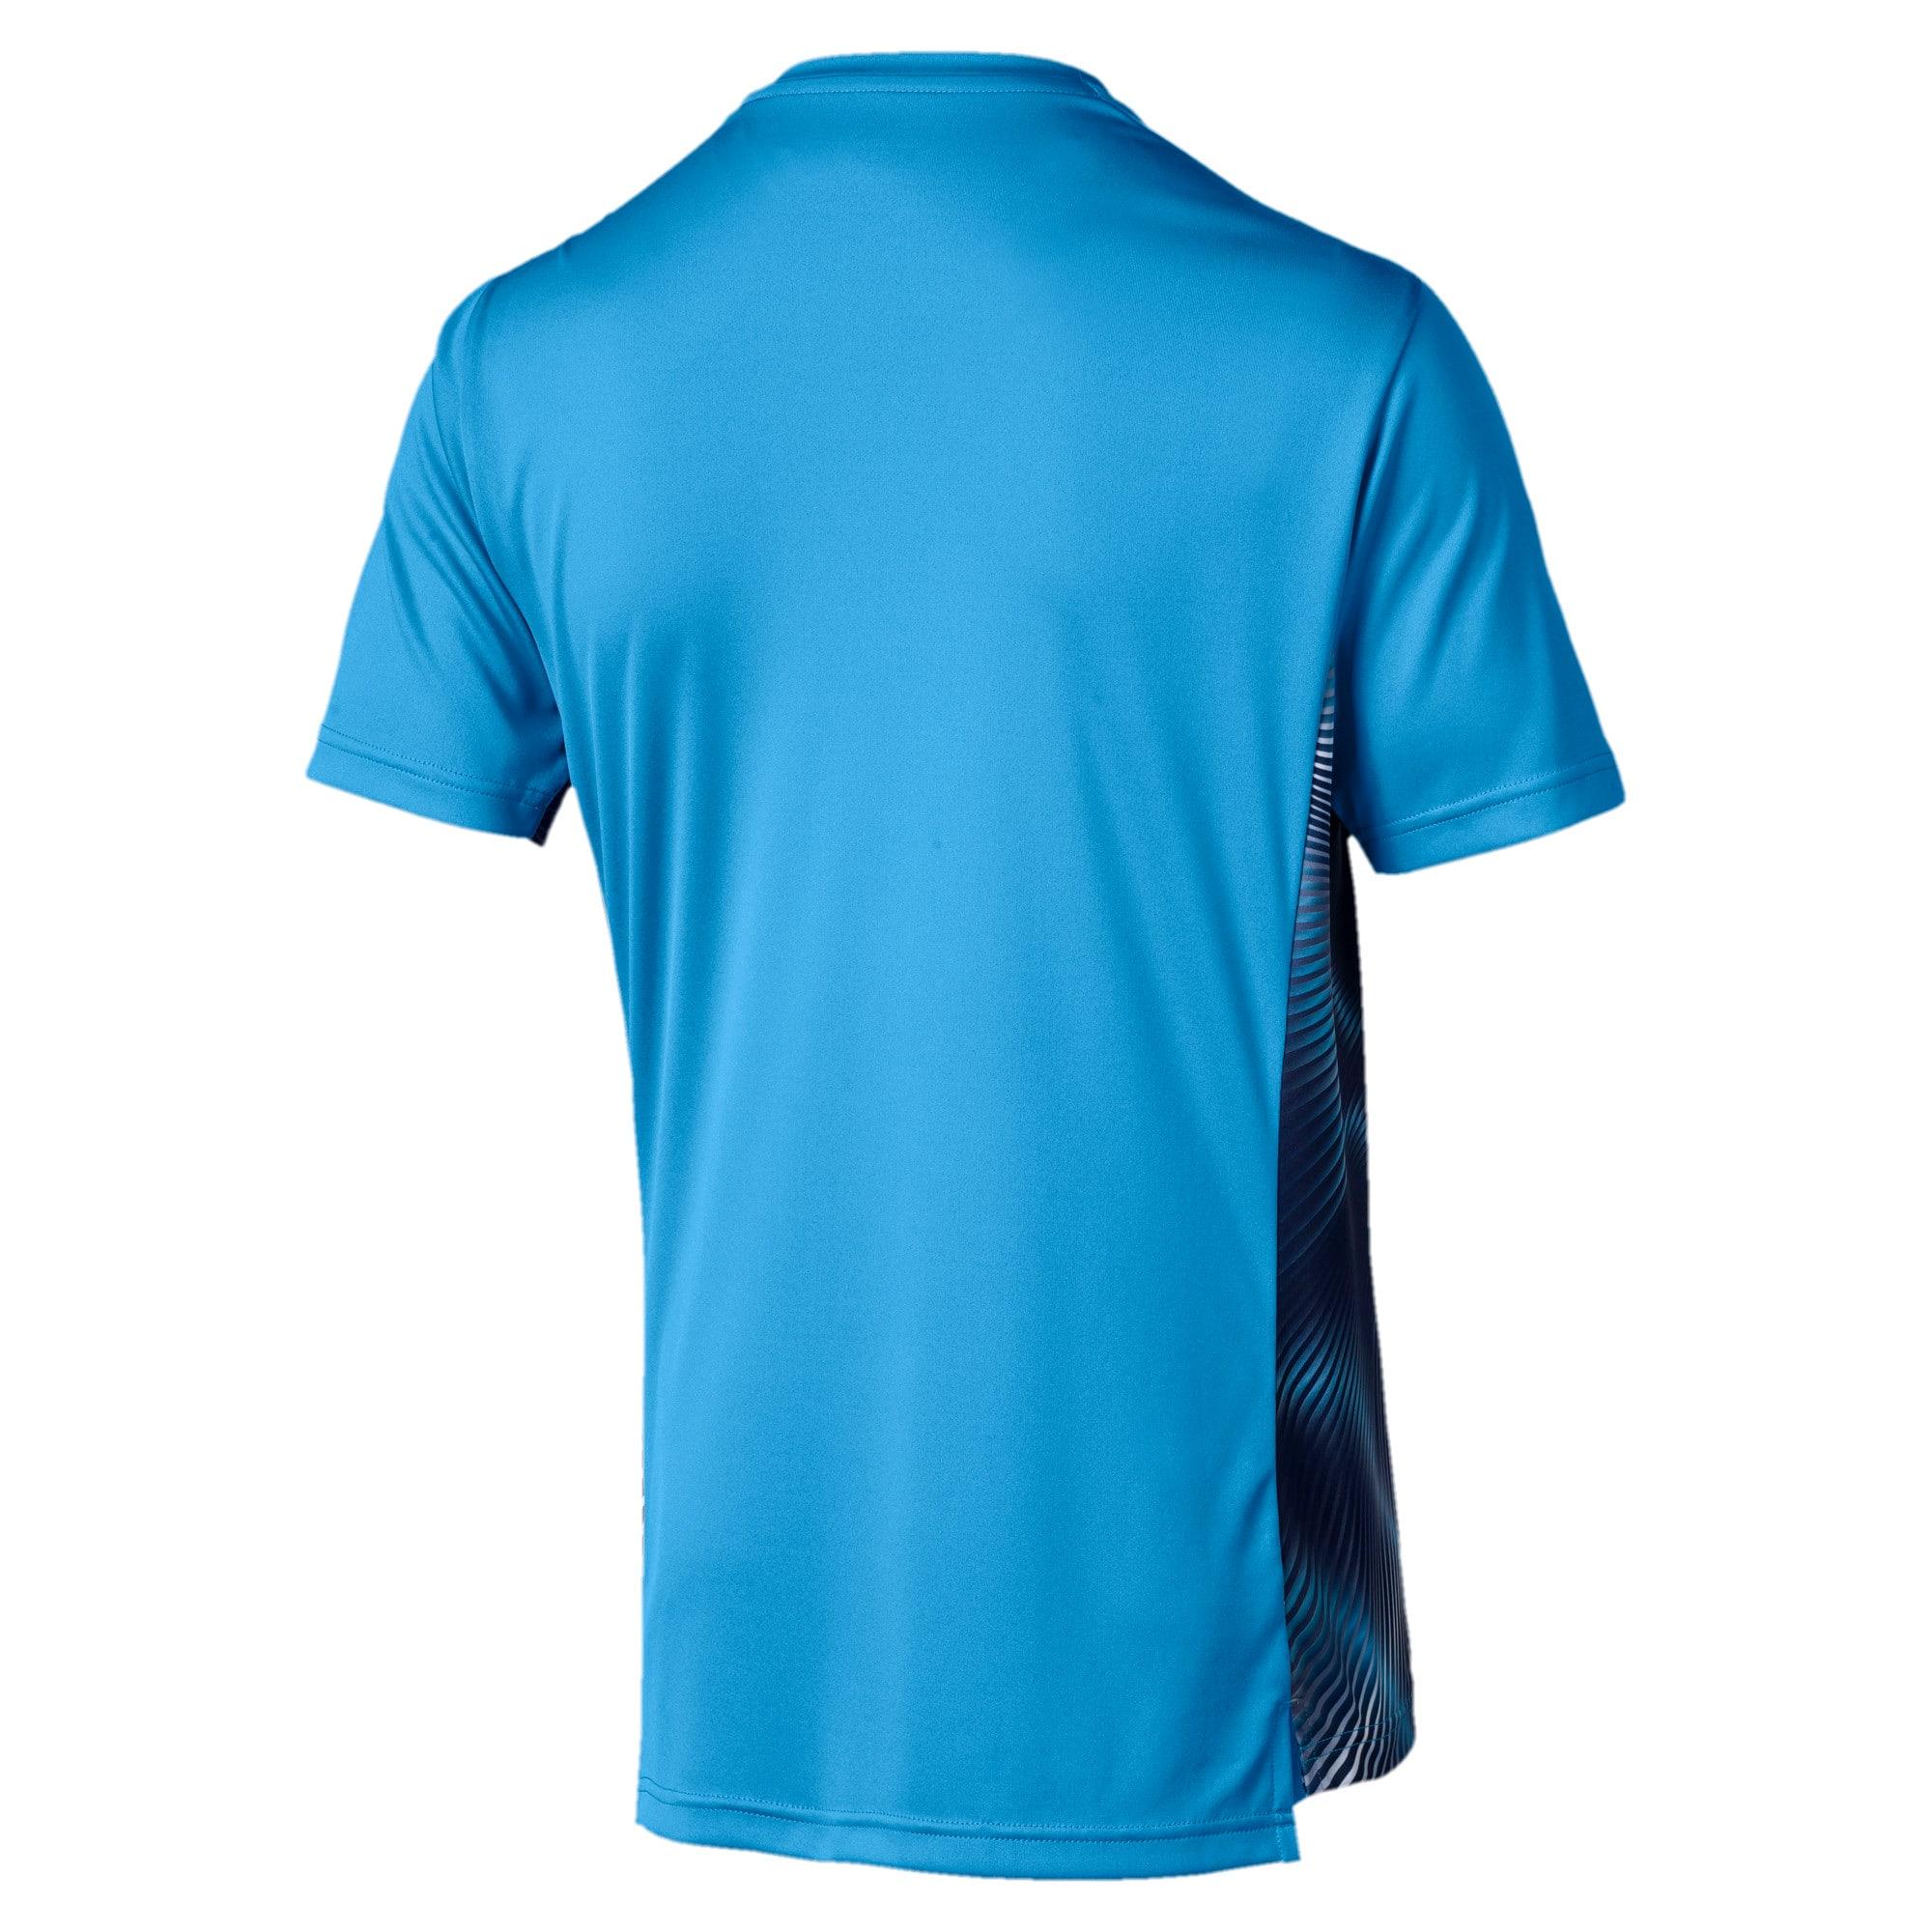 Thumbnail 2 of Valencia CF Men's Stadium Jersey, Bleu Azur-Peacoat, medium